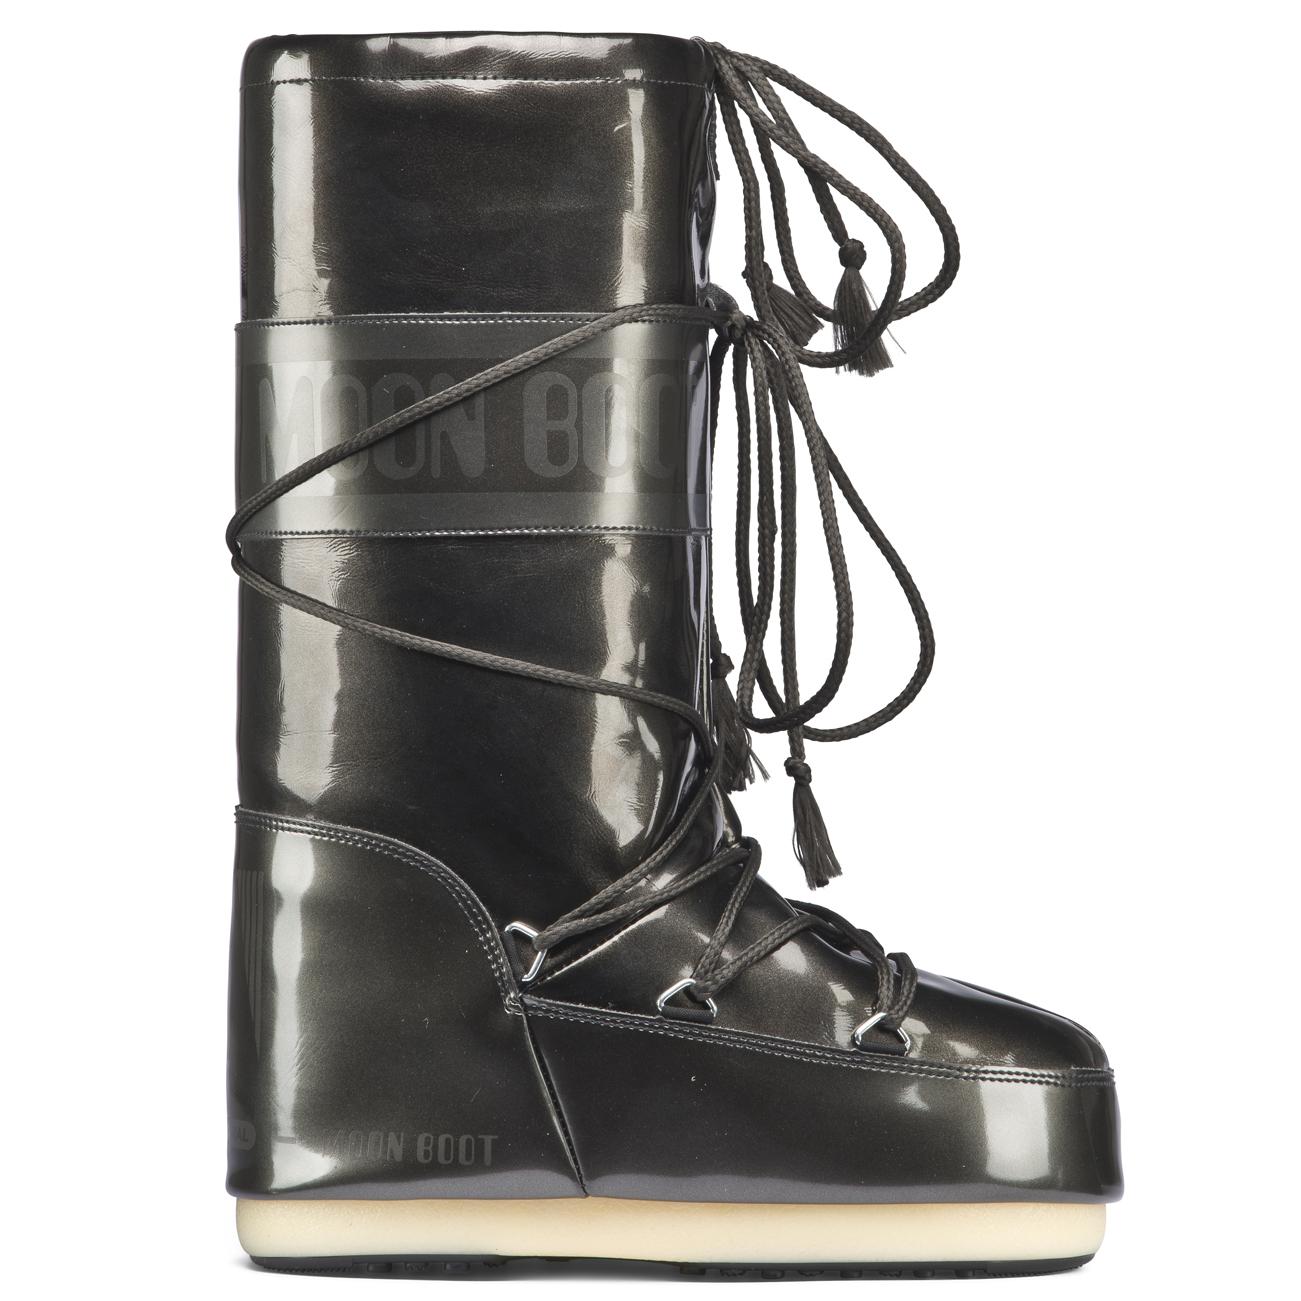 unisex adults original tecnica moon boot vinil met nylon. Black Bedroom Furniture Sets. Home Design Ideas